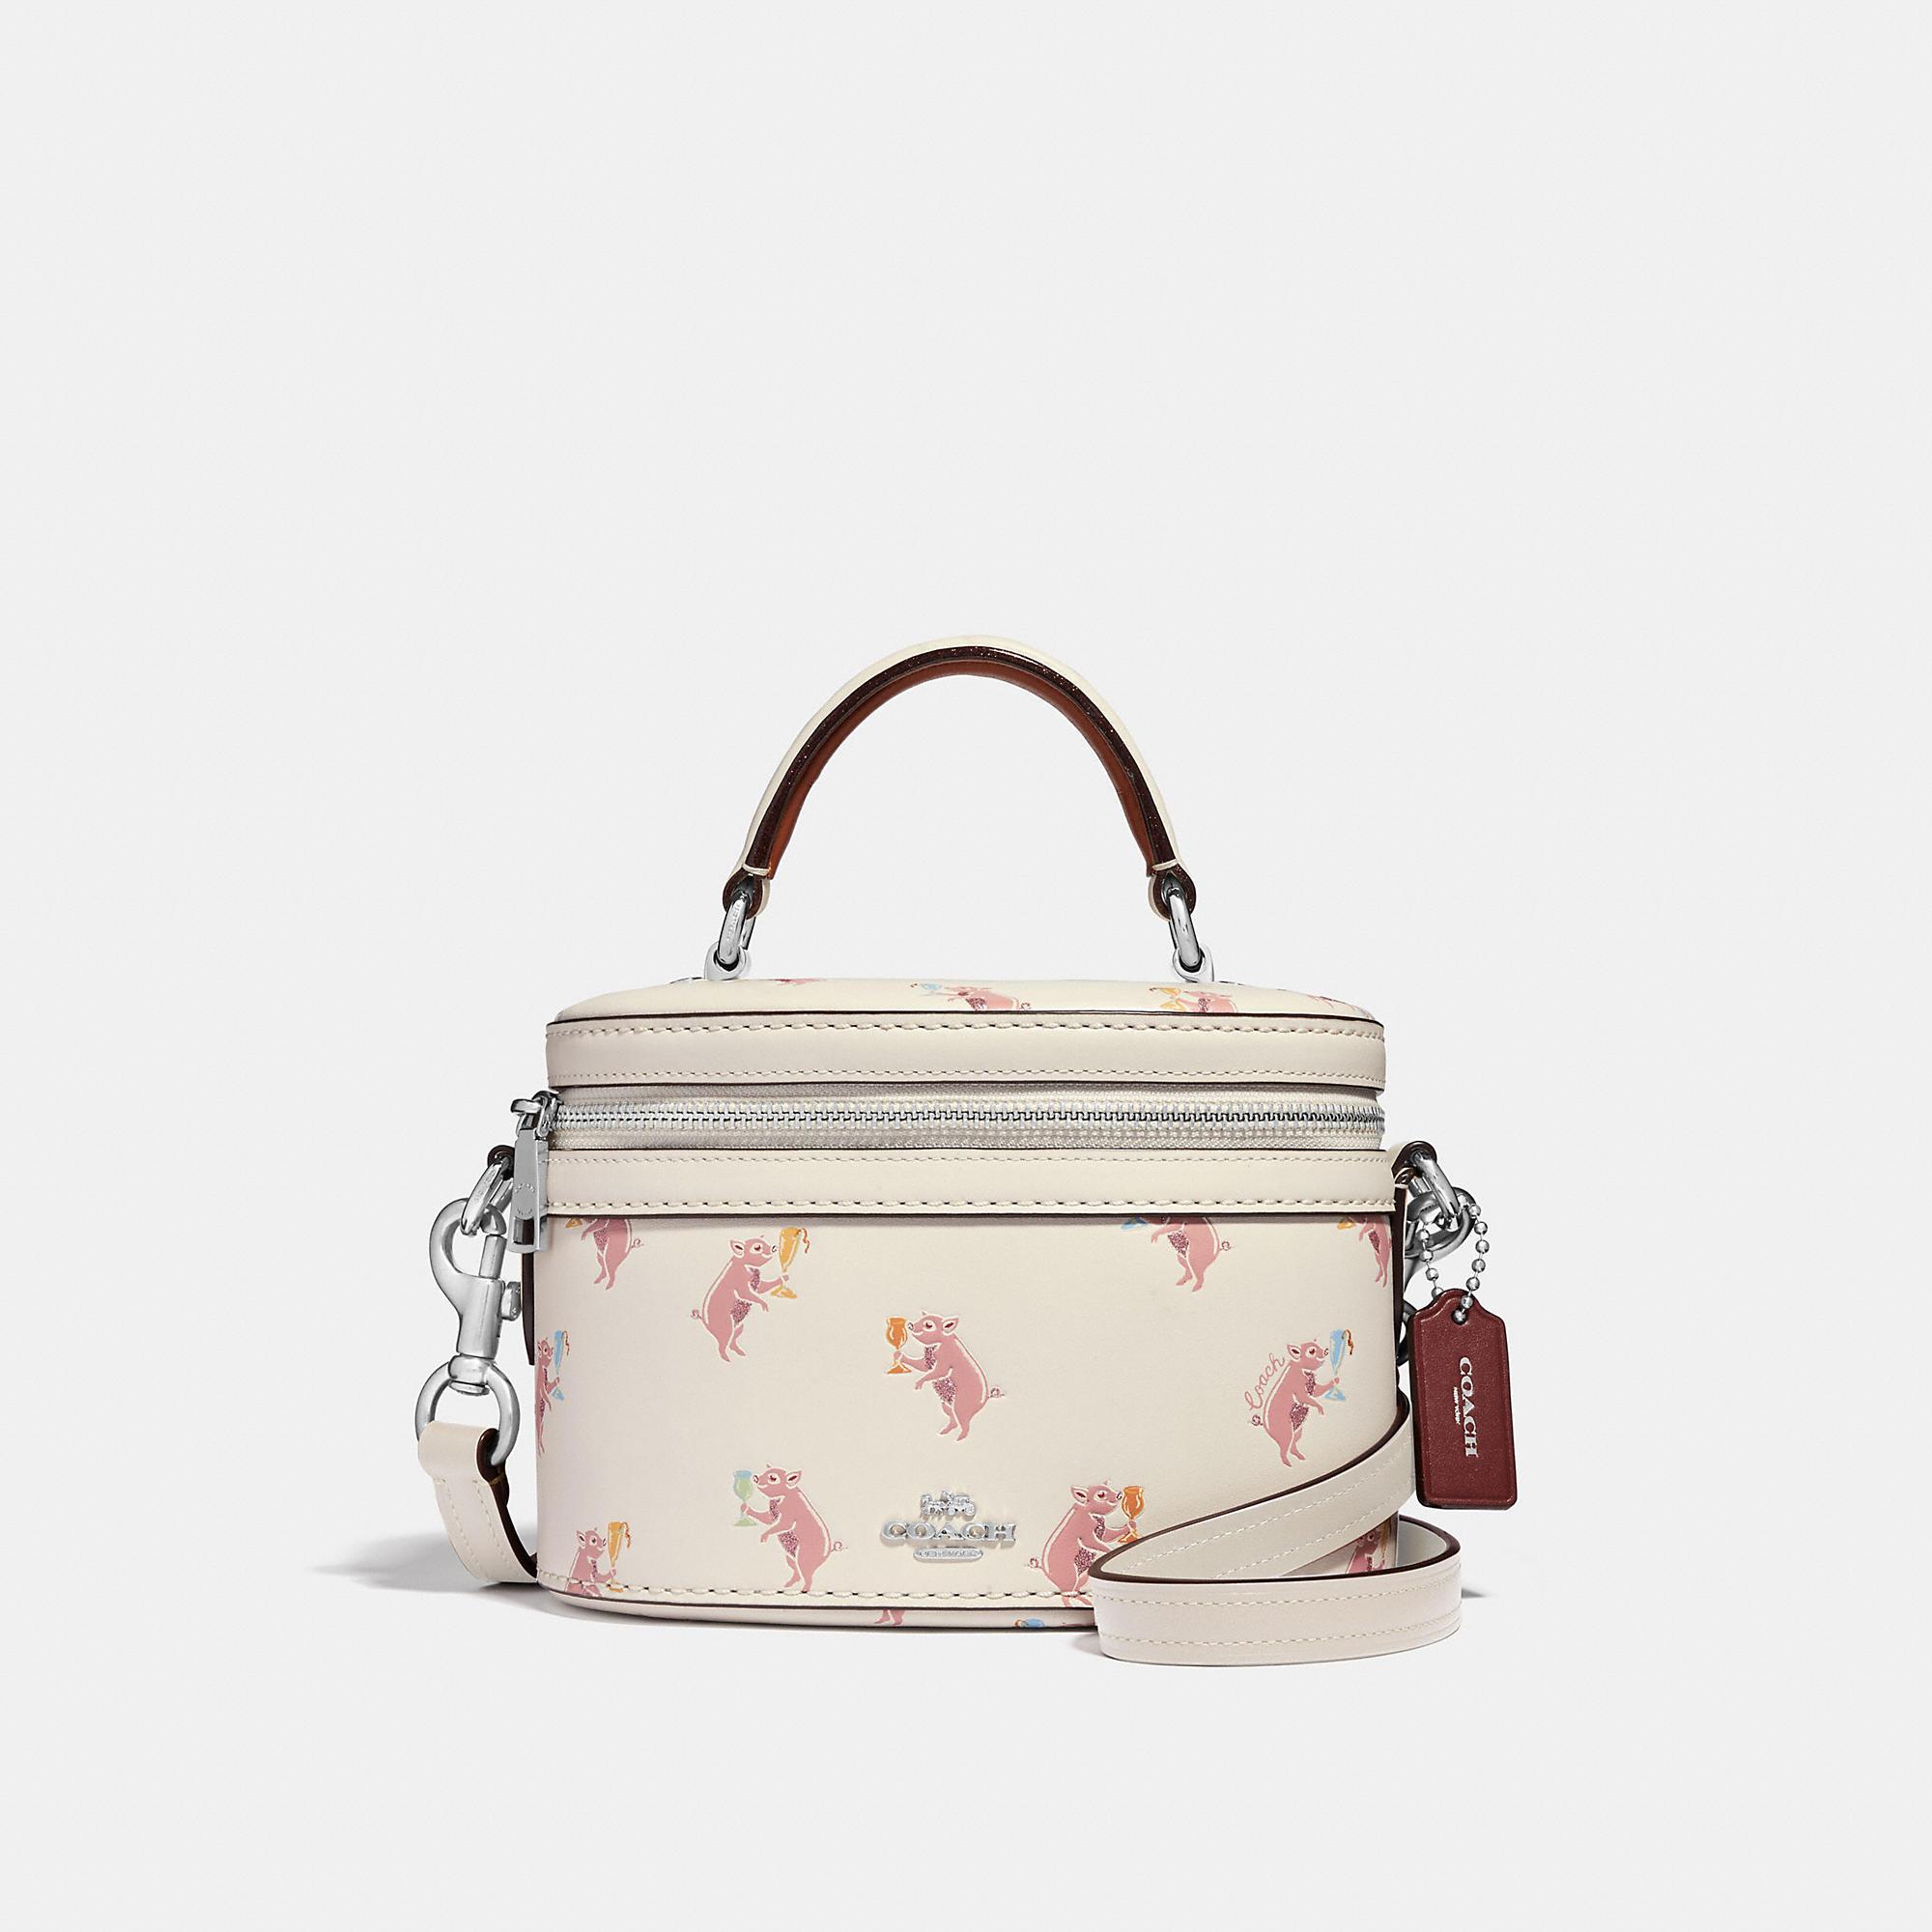 889ebf858a2f COACH Trail Bag With Party Pig Print - Women s Designer Crossbody ...